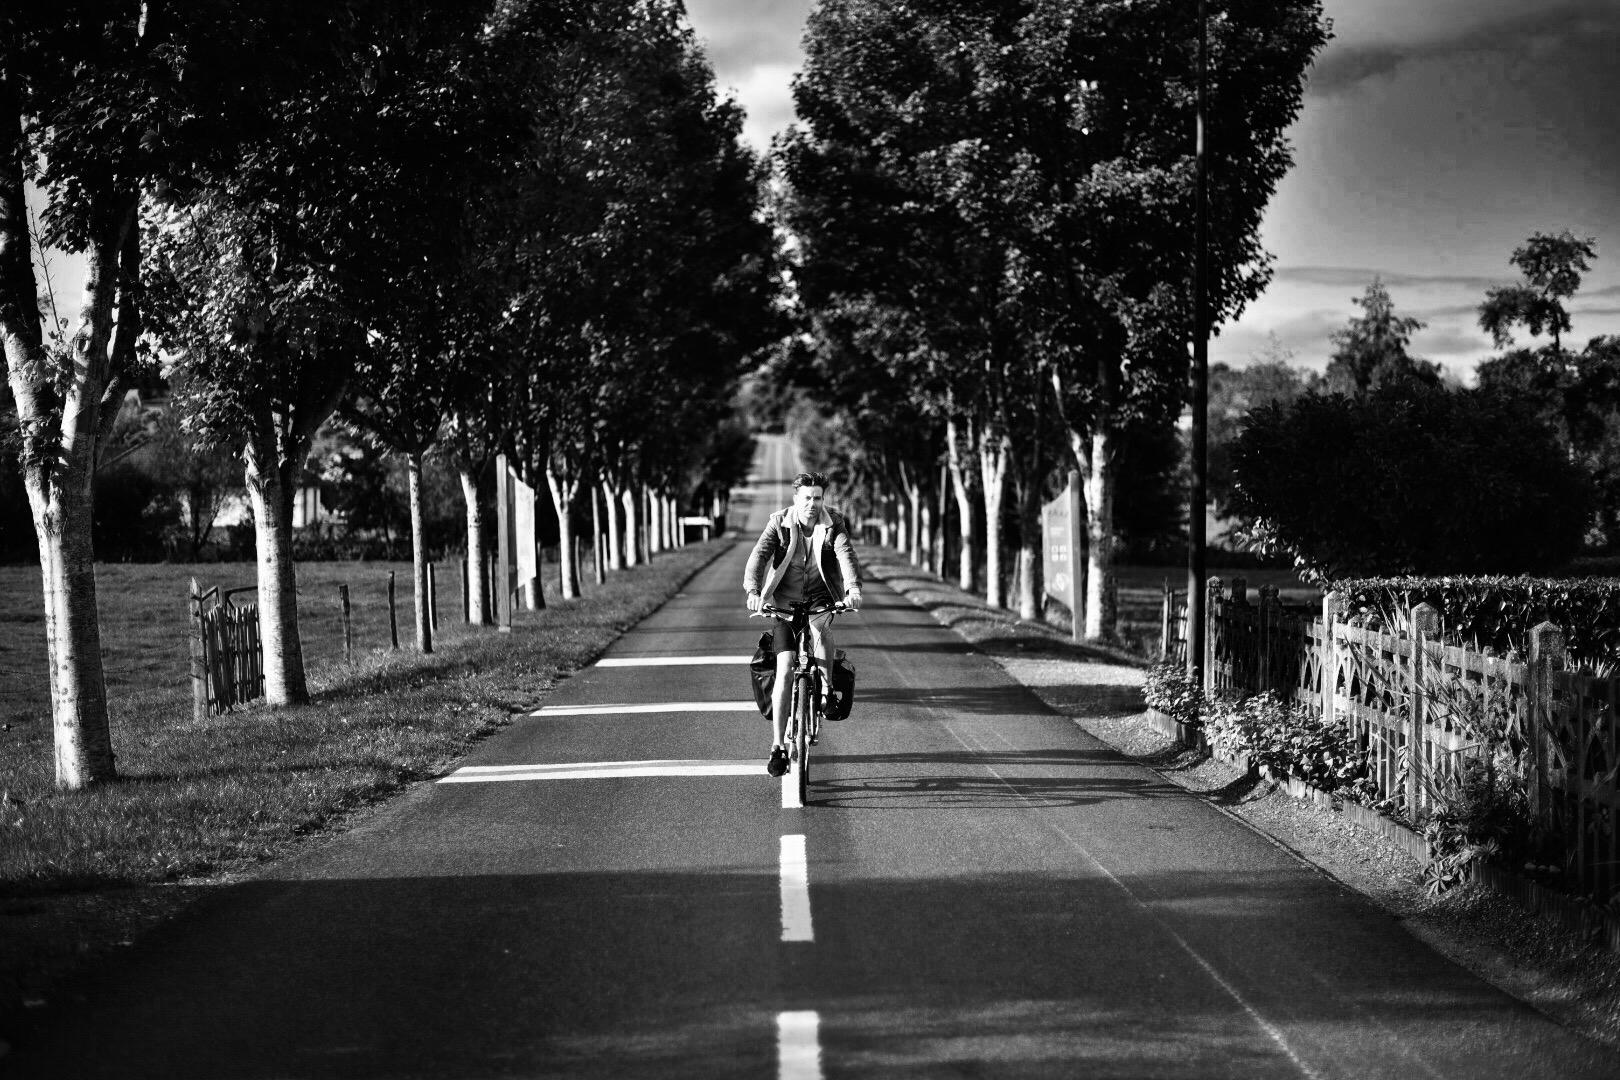 Tom_Oliver_Payne_London_to_Paris_Cycle-10.jpg